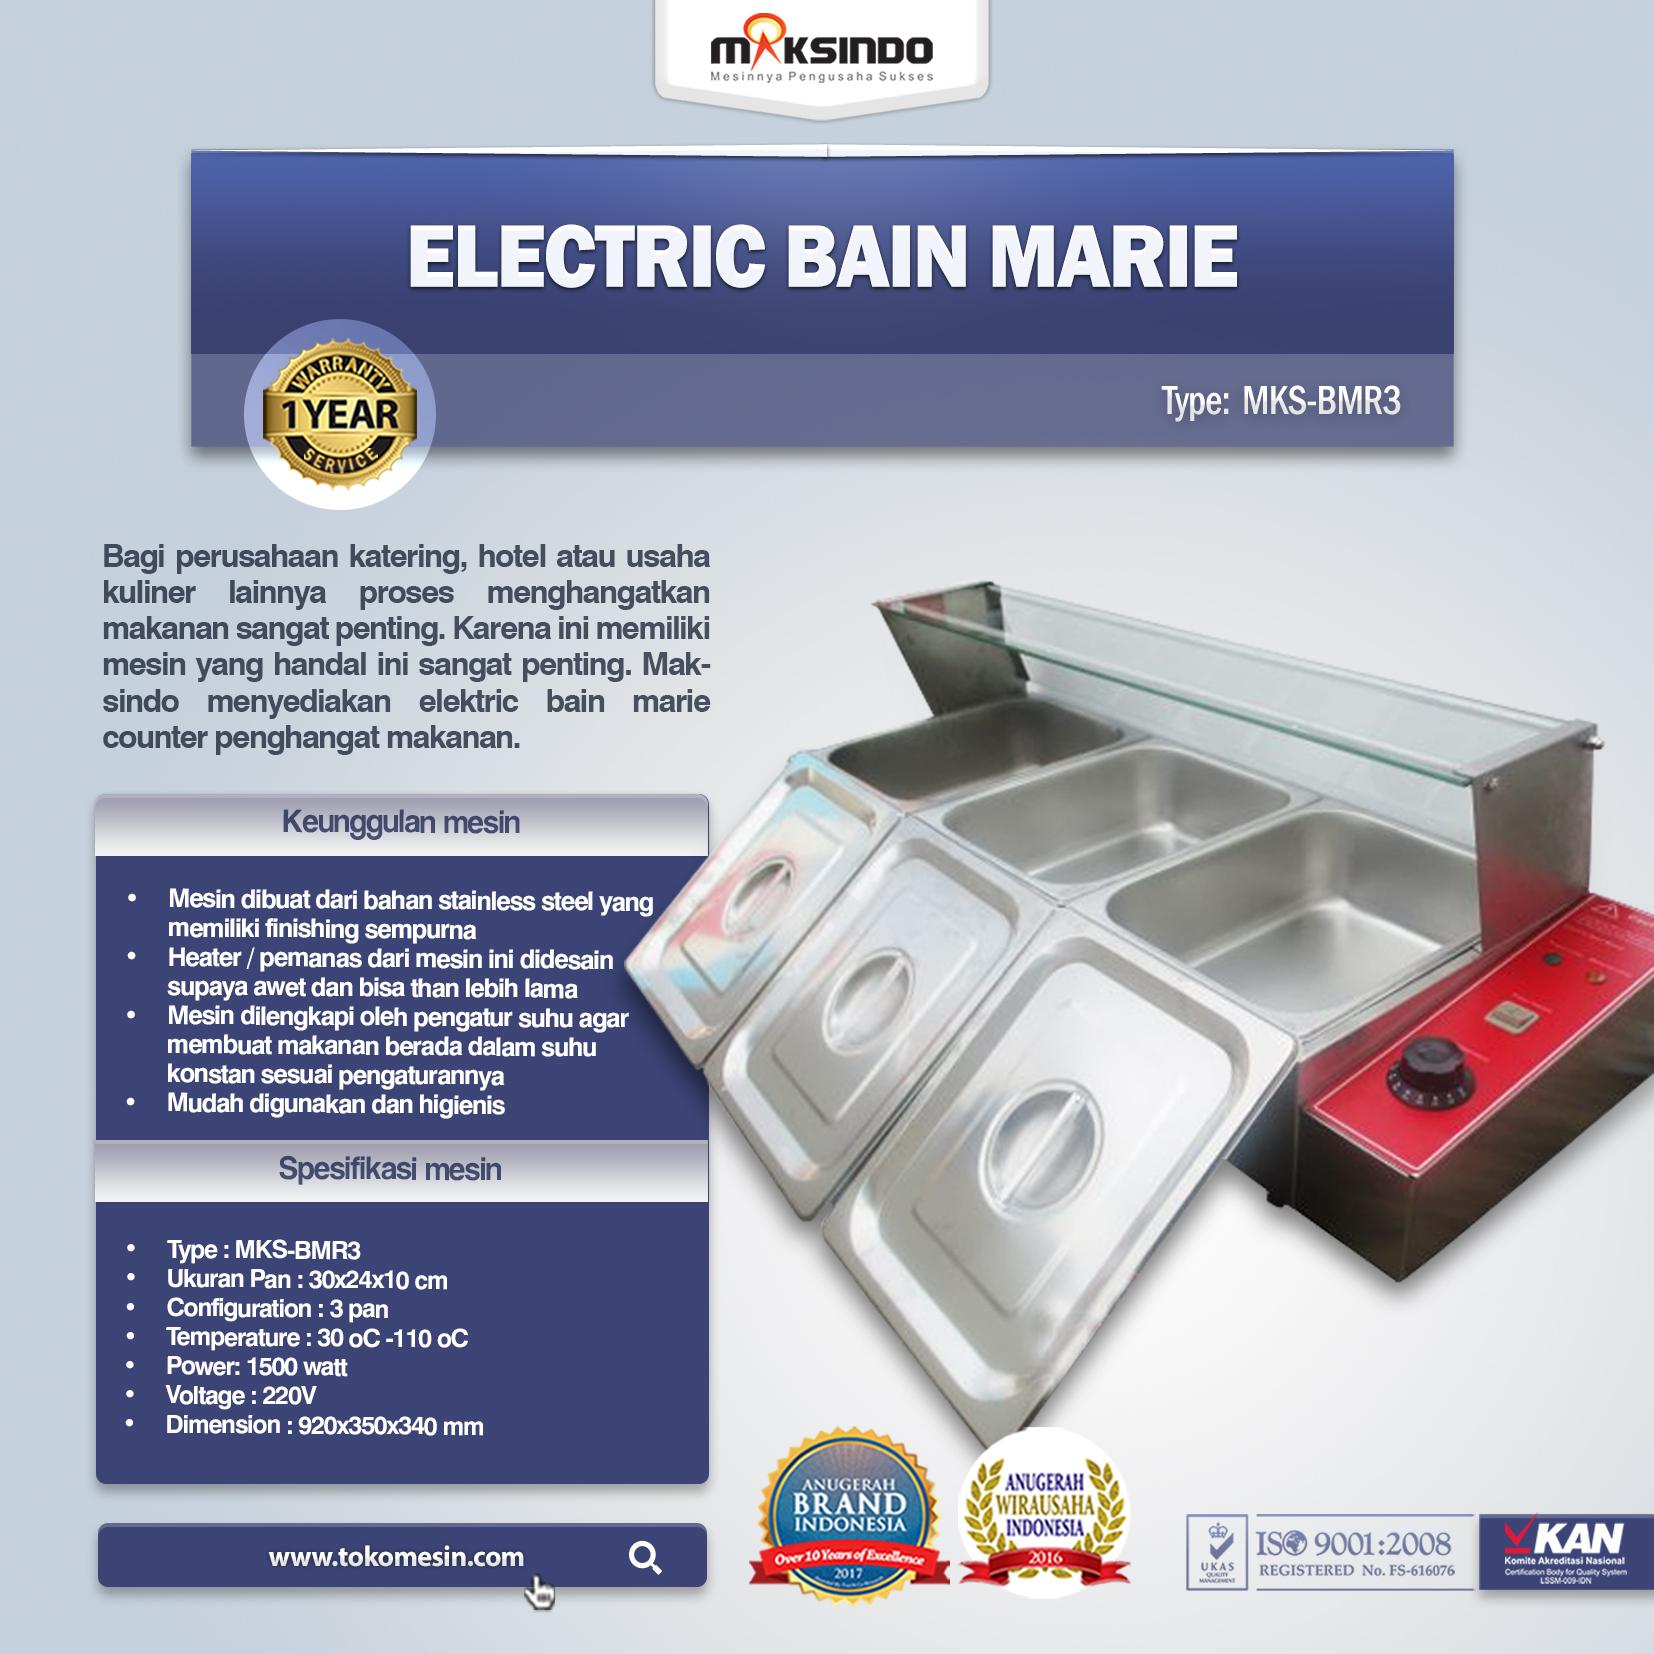 Electric Warmer Penghangat Makanan Minuman Pemanas Elektrik Harga Elektronik Lunch Box Sj0052 Jual Bain Marie Mks Bmr3 Di Medan